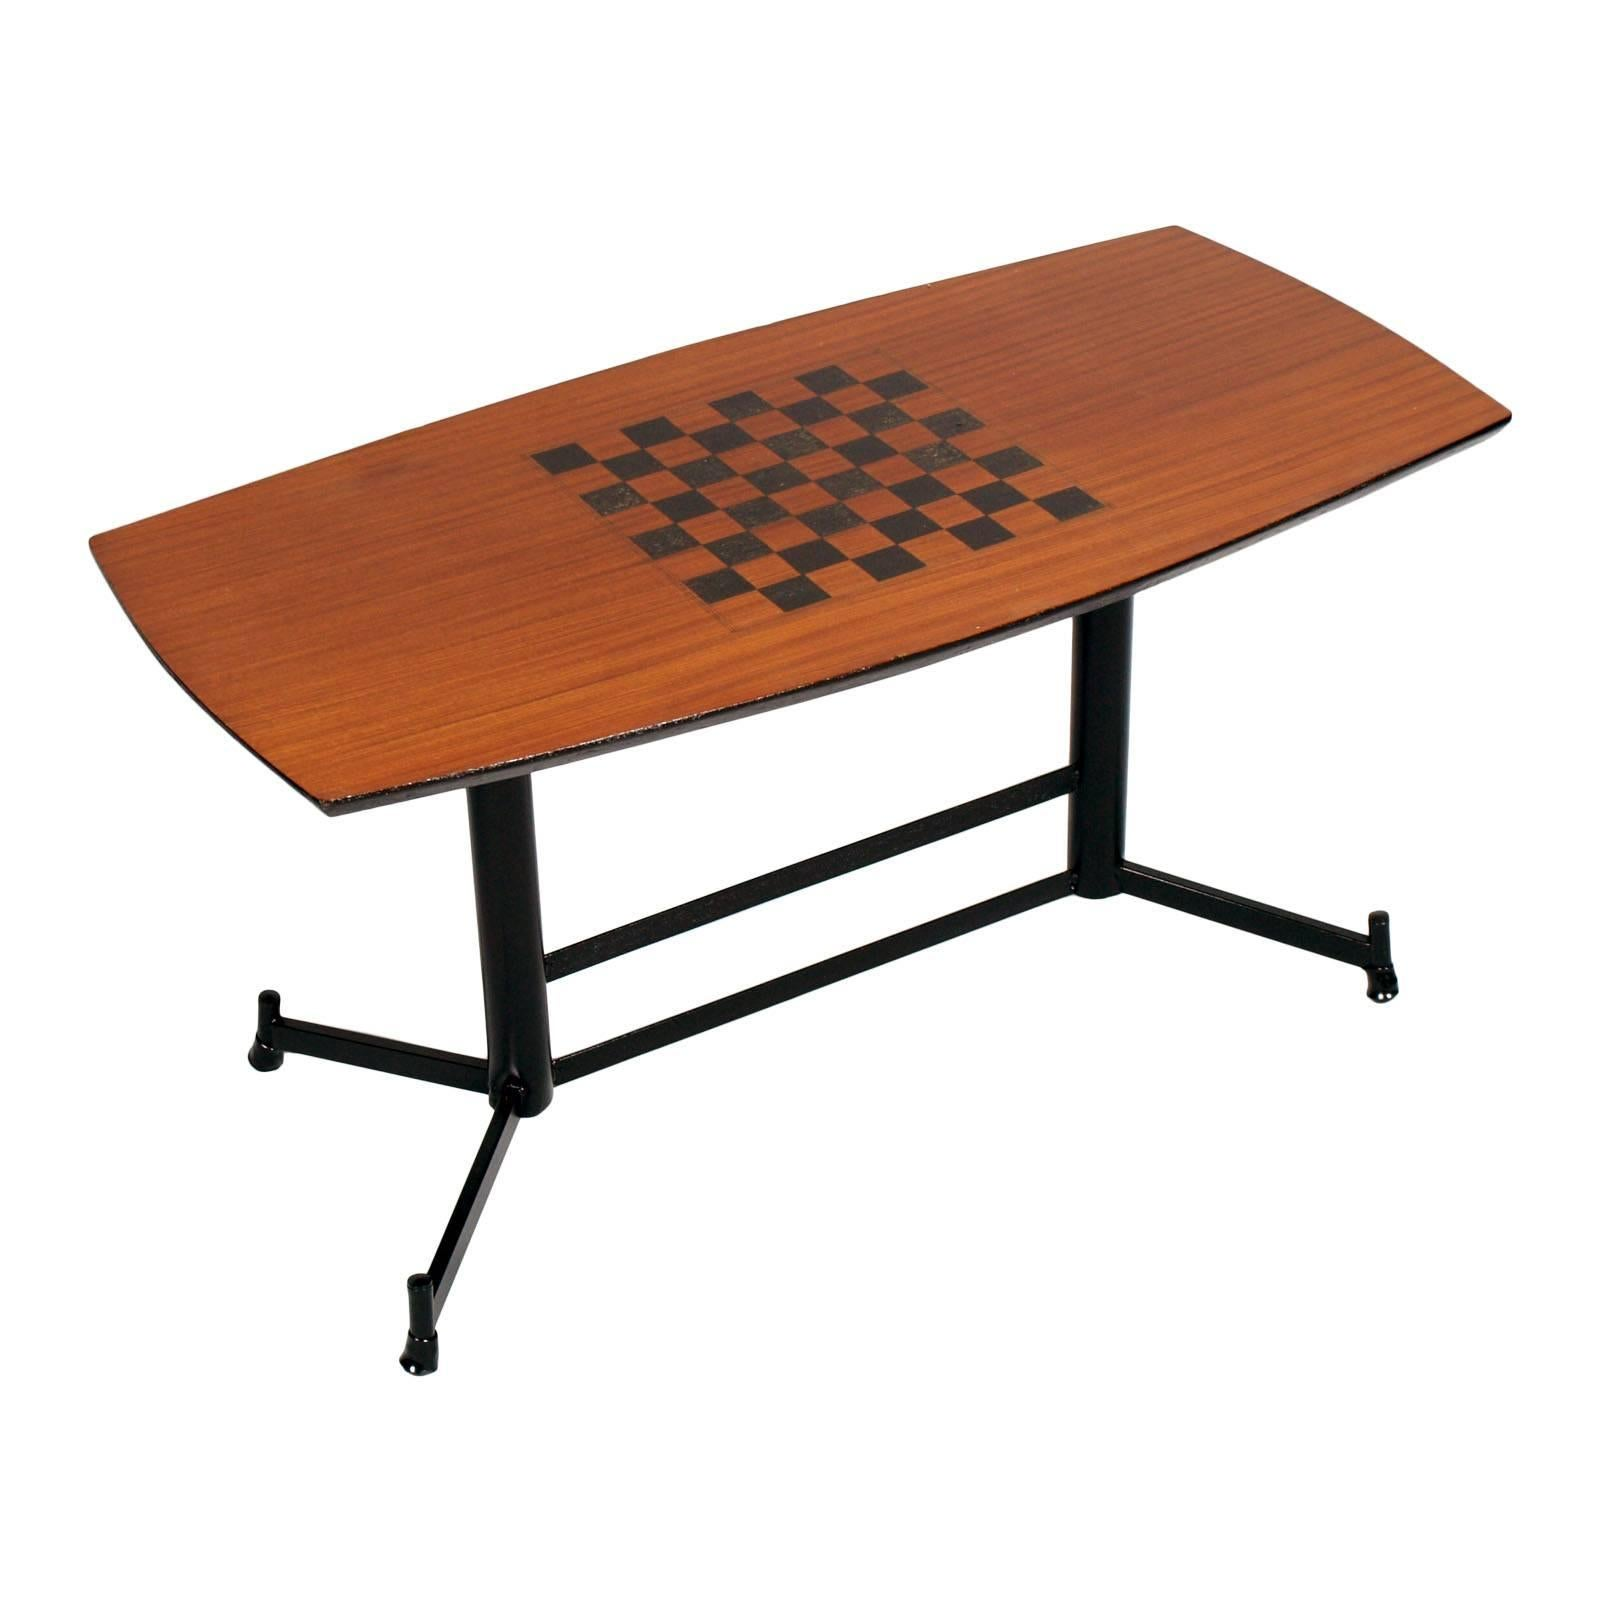 1970s Gambling Table or Coffee Table Attributed to Osvaldo Borsani for Tecno